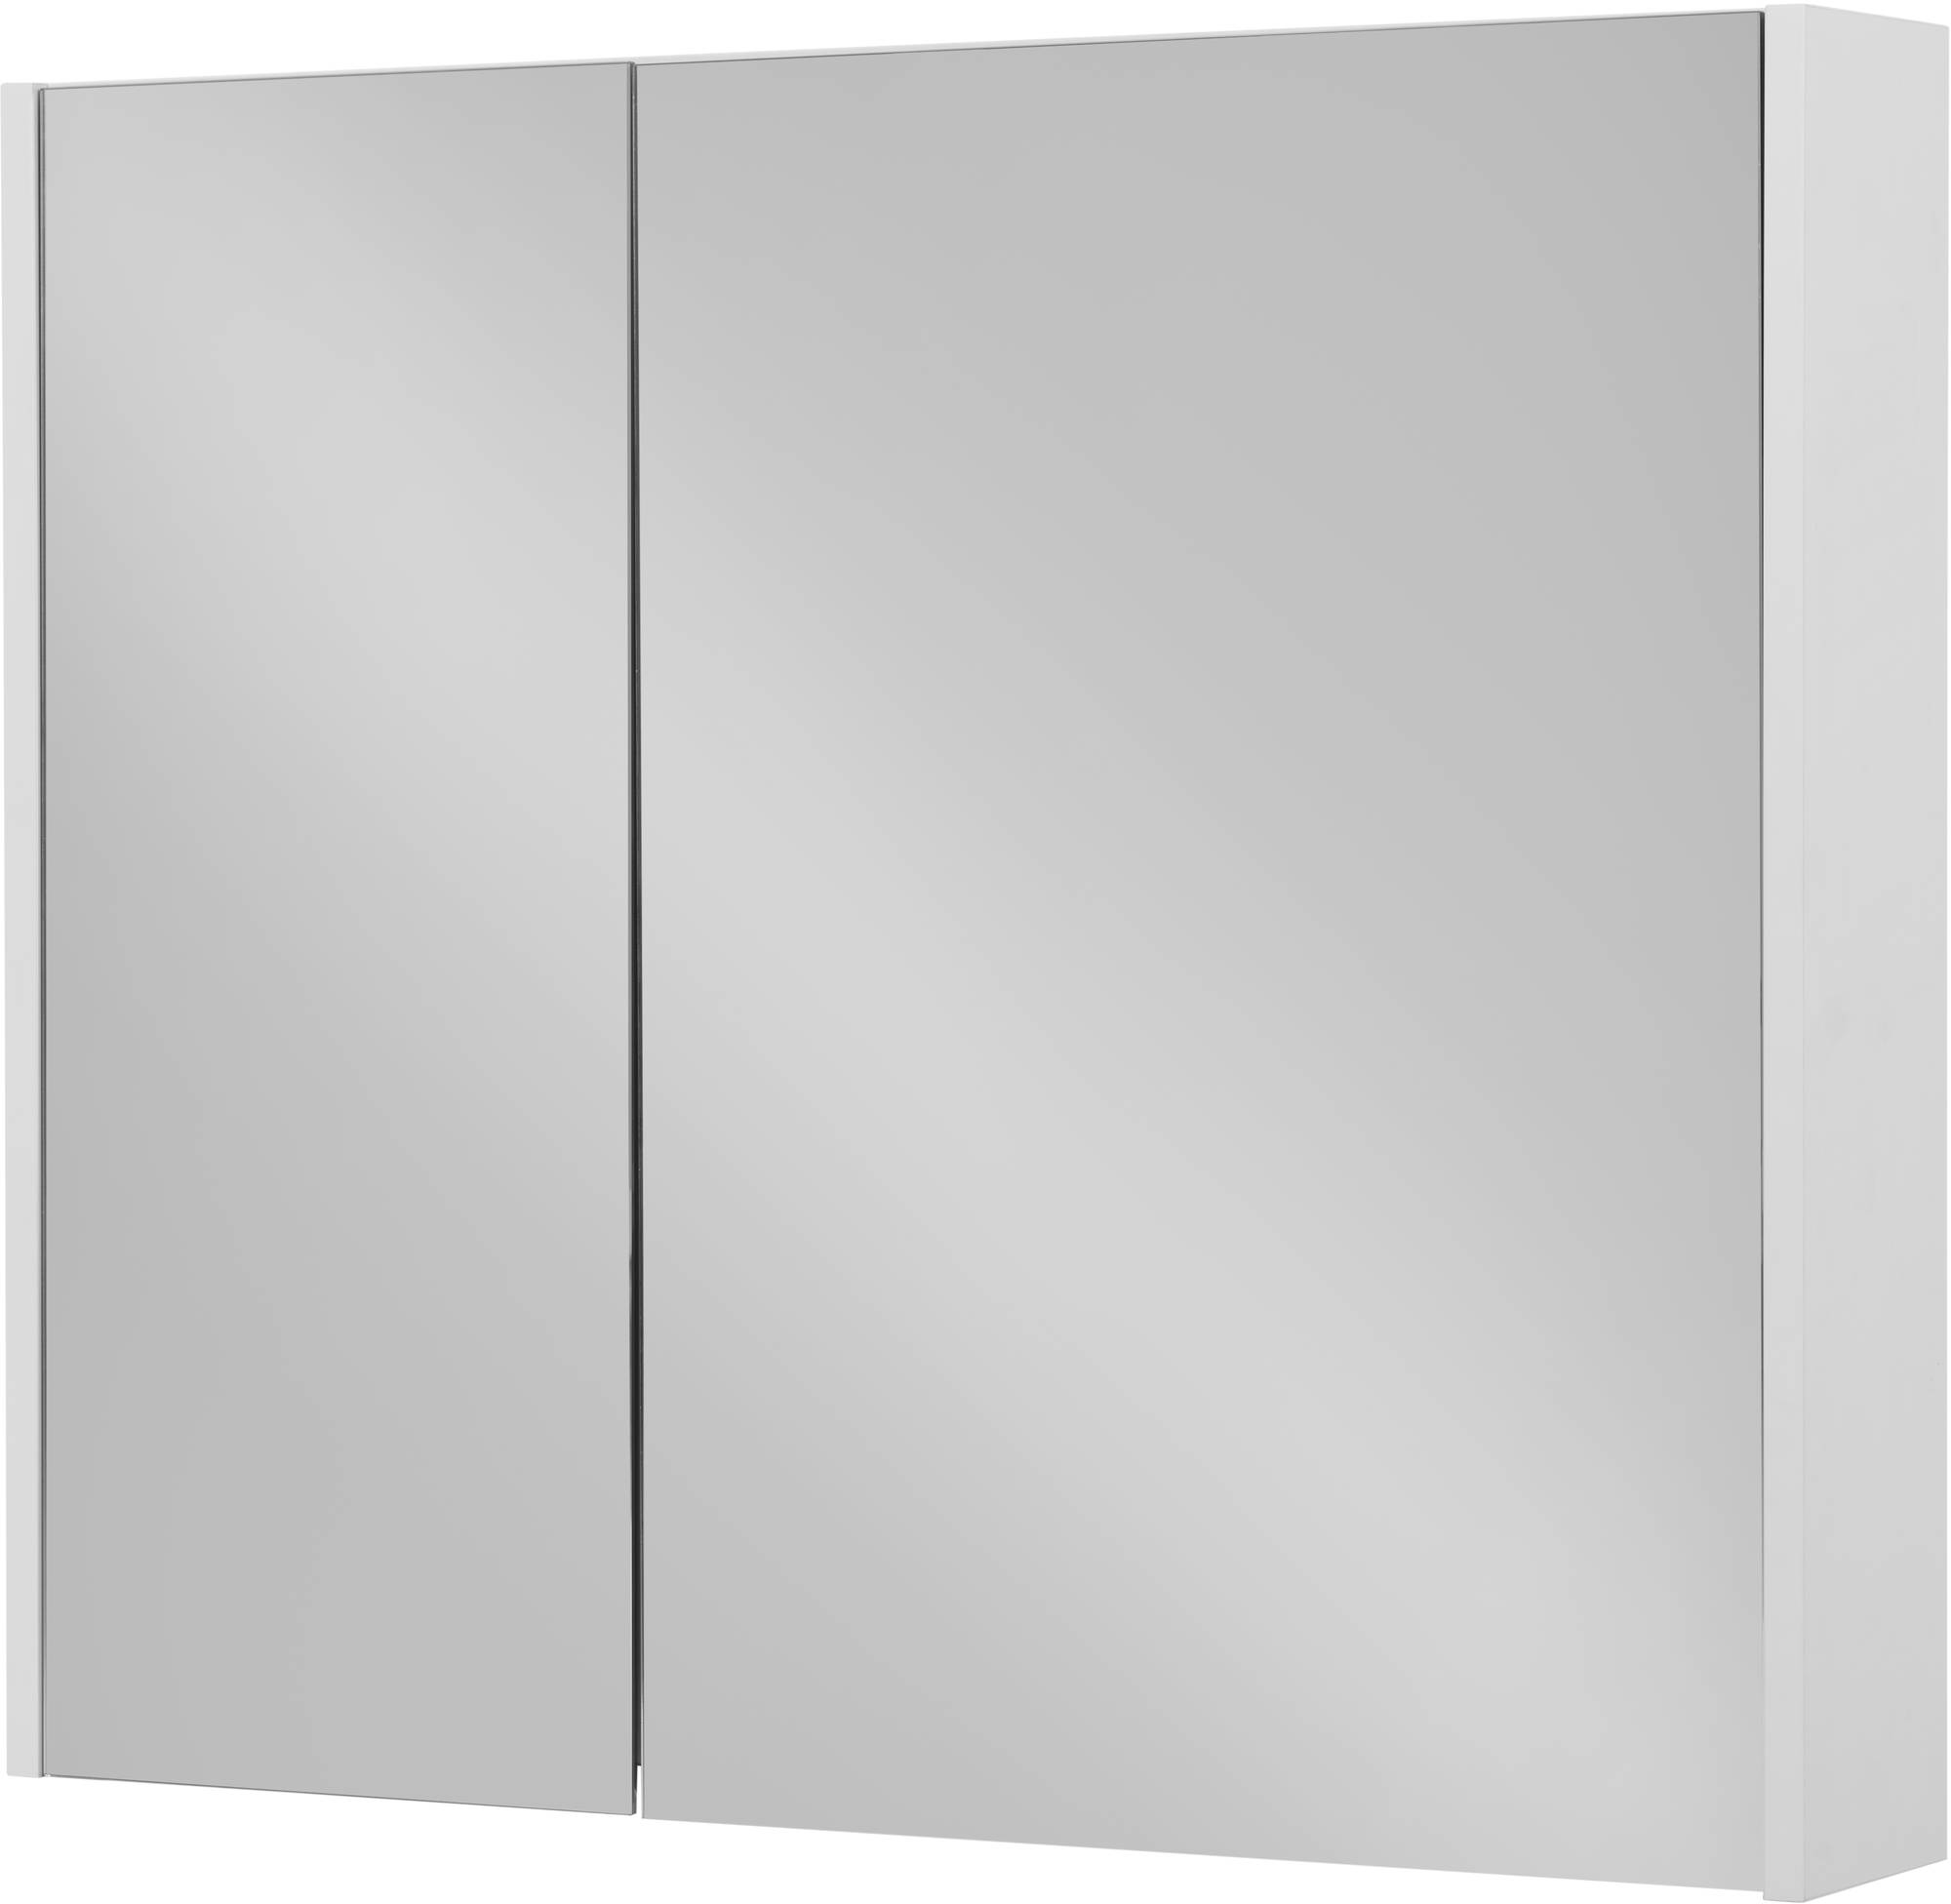 Saniselect Socan Spiegelkast 80x14x70 cm Mat Wit